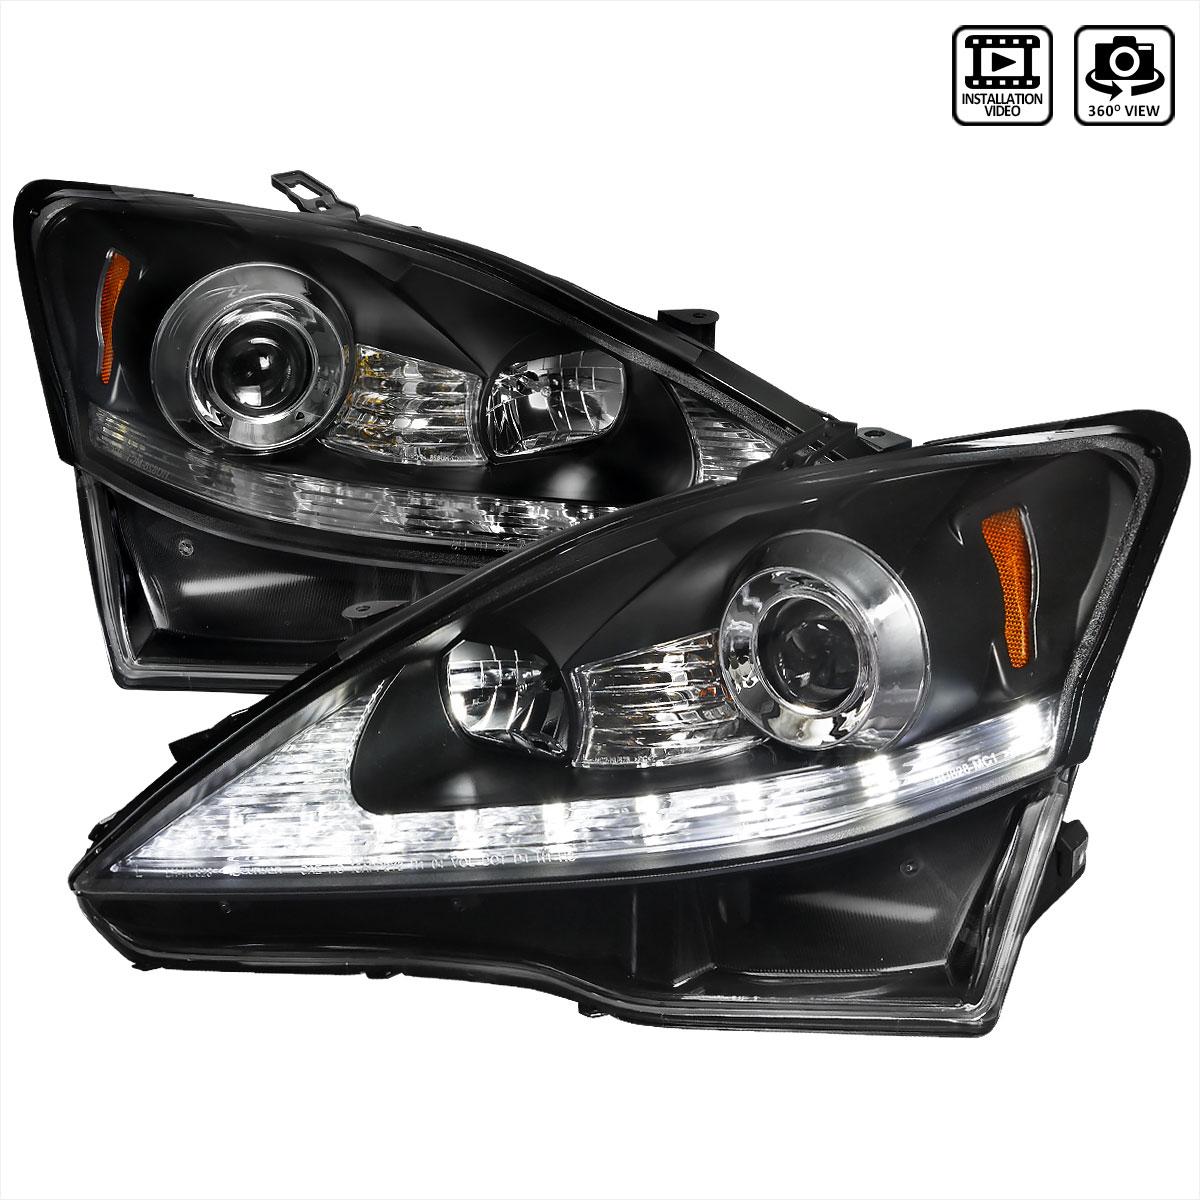 2006 lexus is250 headlights portable charger pixel 3